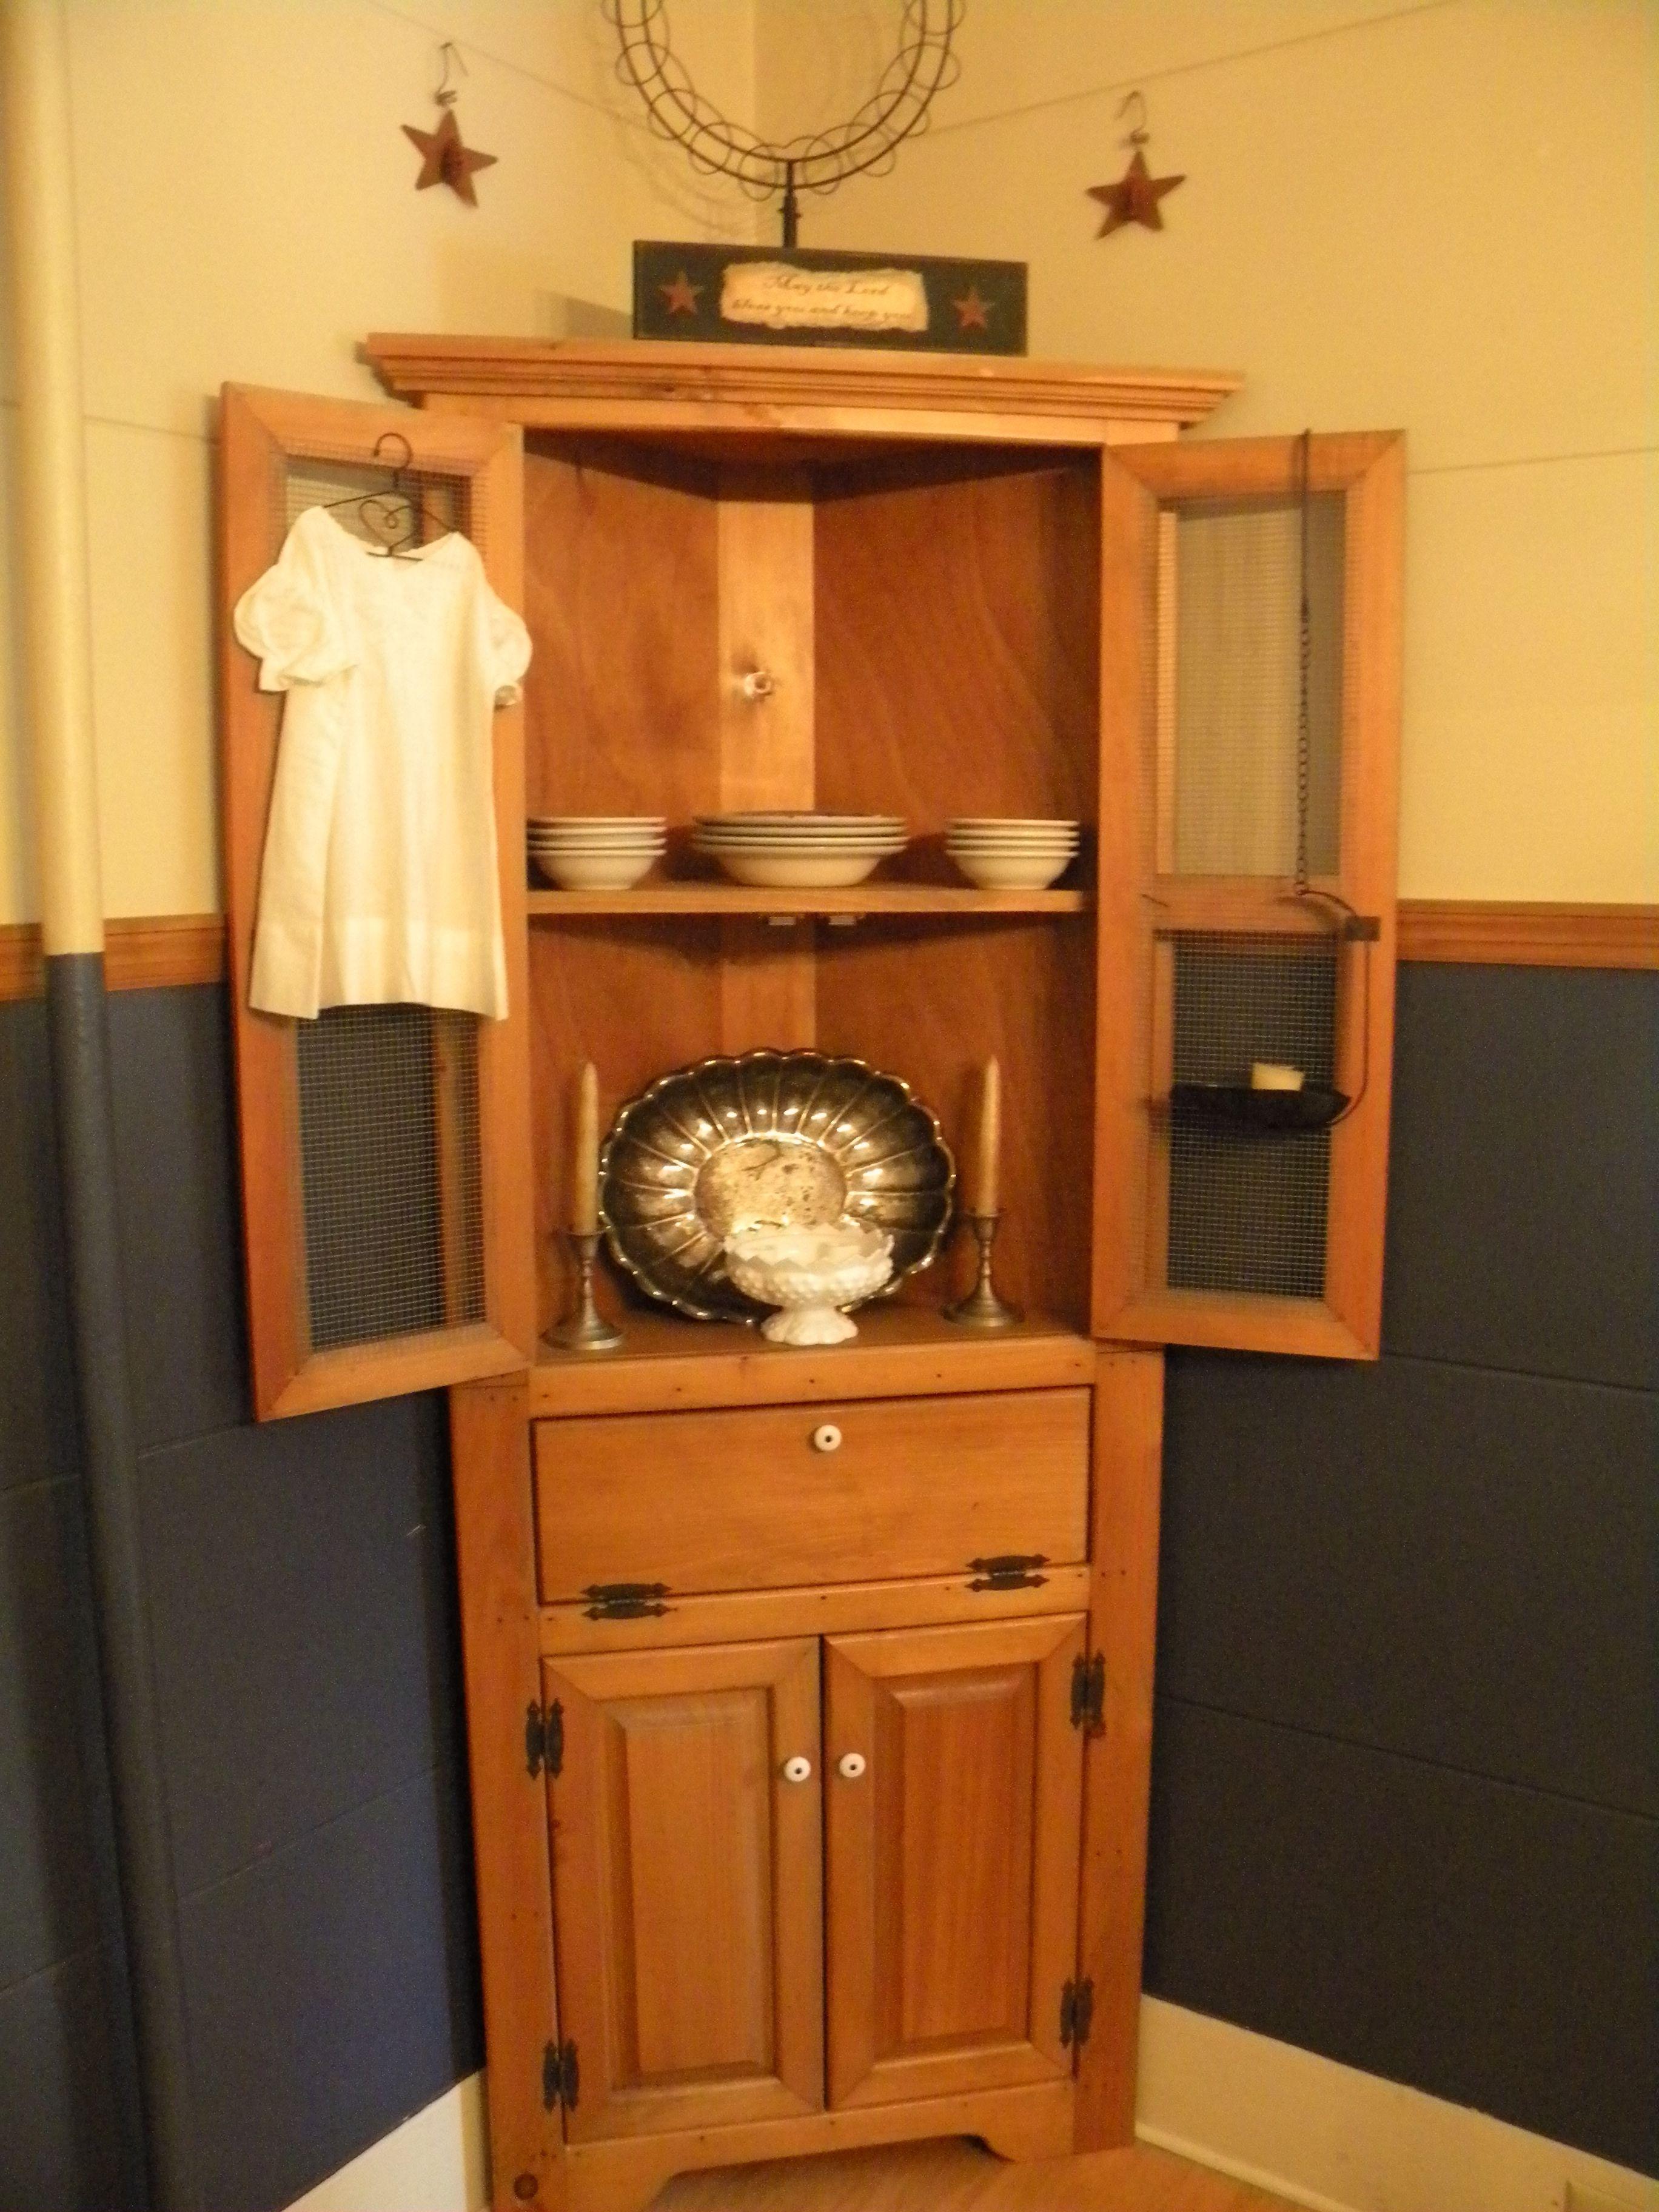 Dining Room Corner Cabinet Ideas  Httpbetdaffaires Magnificent Corner Hutch Dining Room Furniture Inspiration